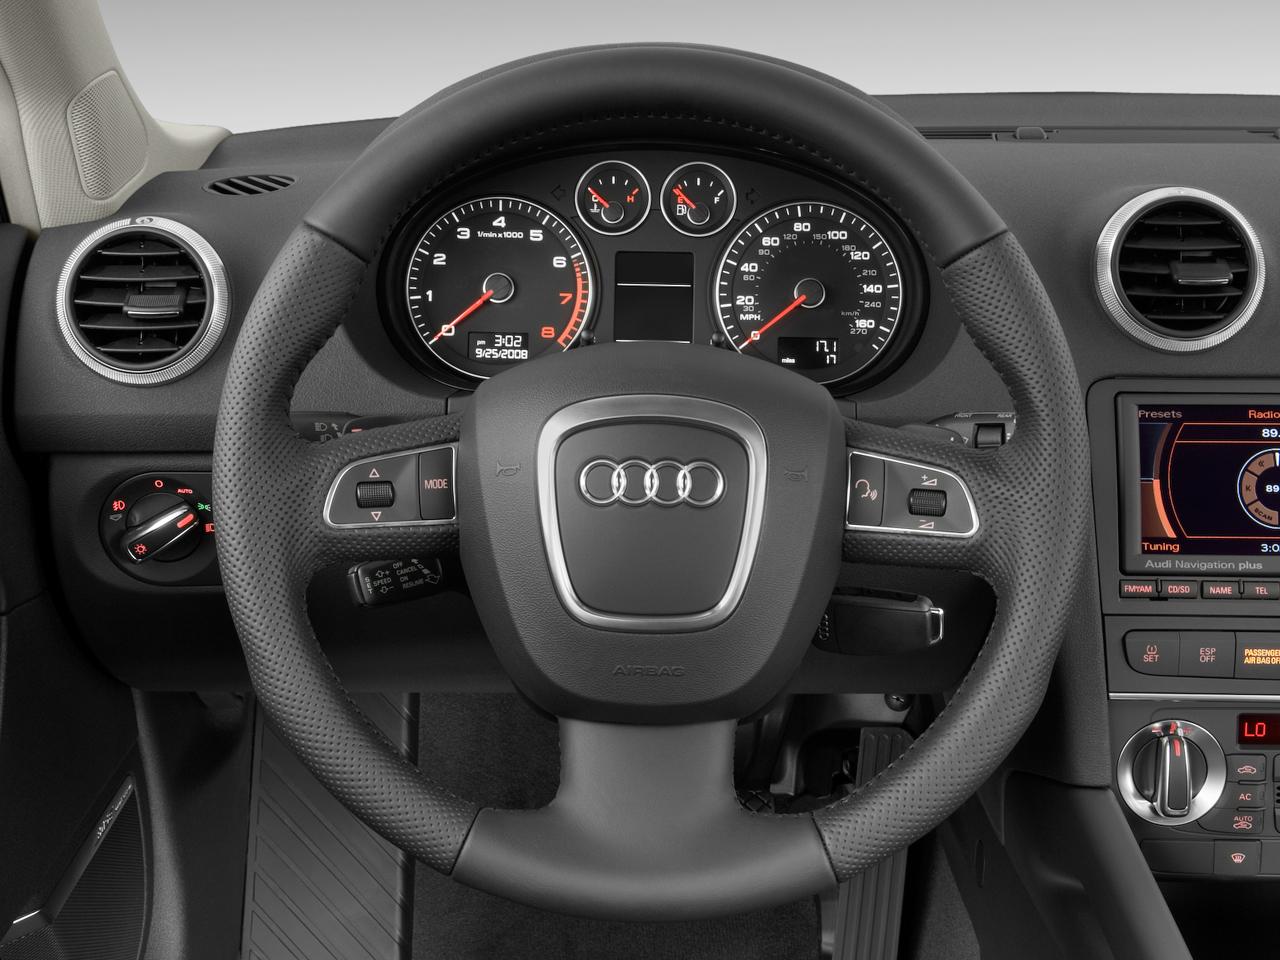 2009 audi a3 2.0t quattro - audi luxury wagon review - automobile